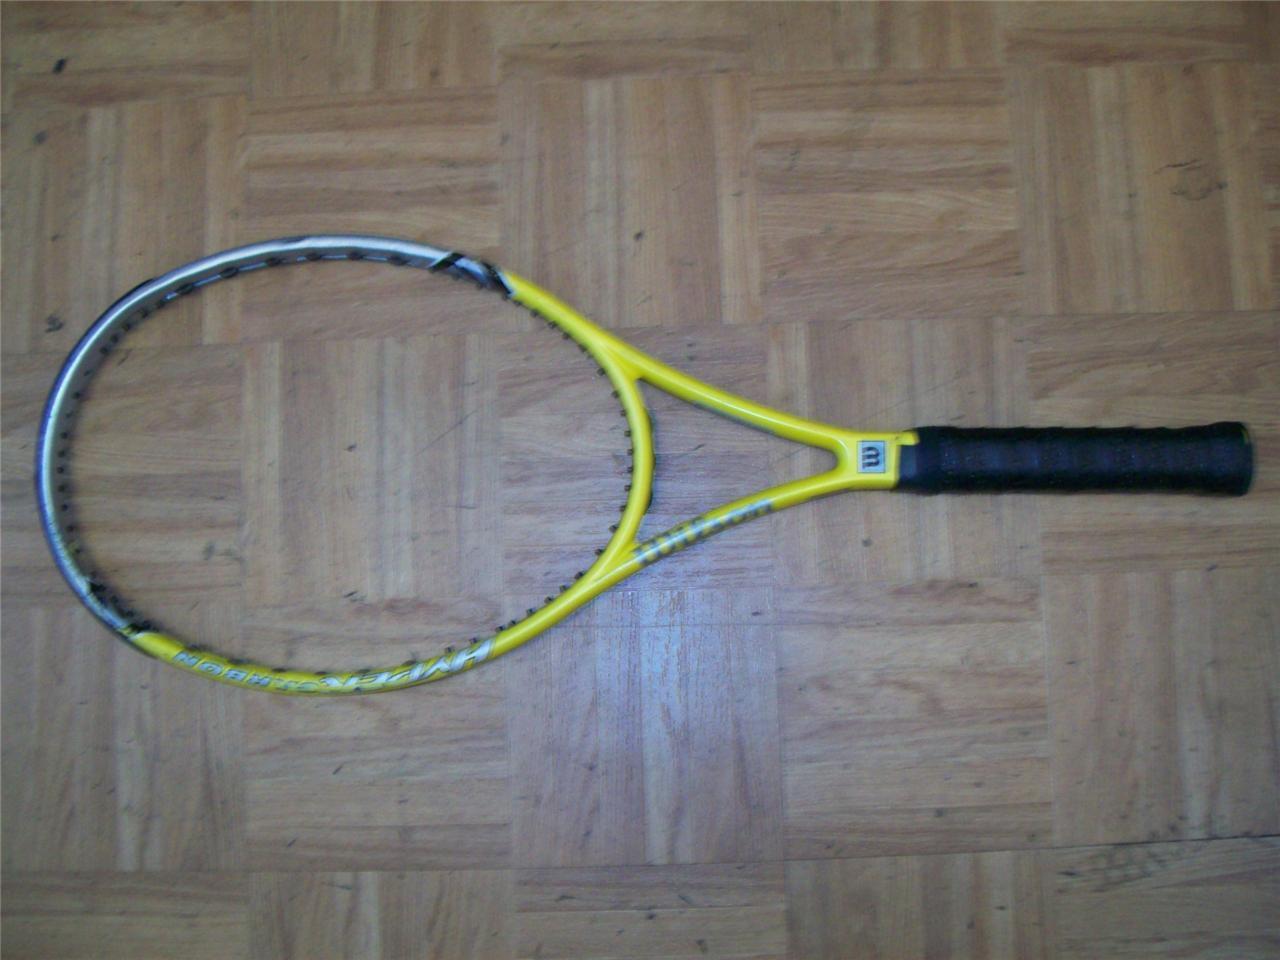 Wilson Hyper Hammer 6,6 Midplus 98 4 3  8 Grip Tenis Raqueta  solo para ti